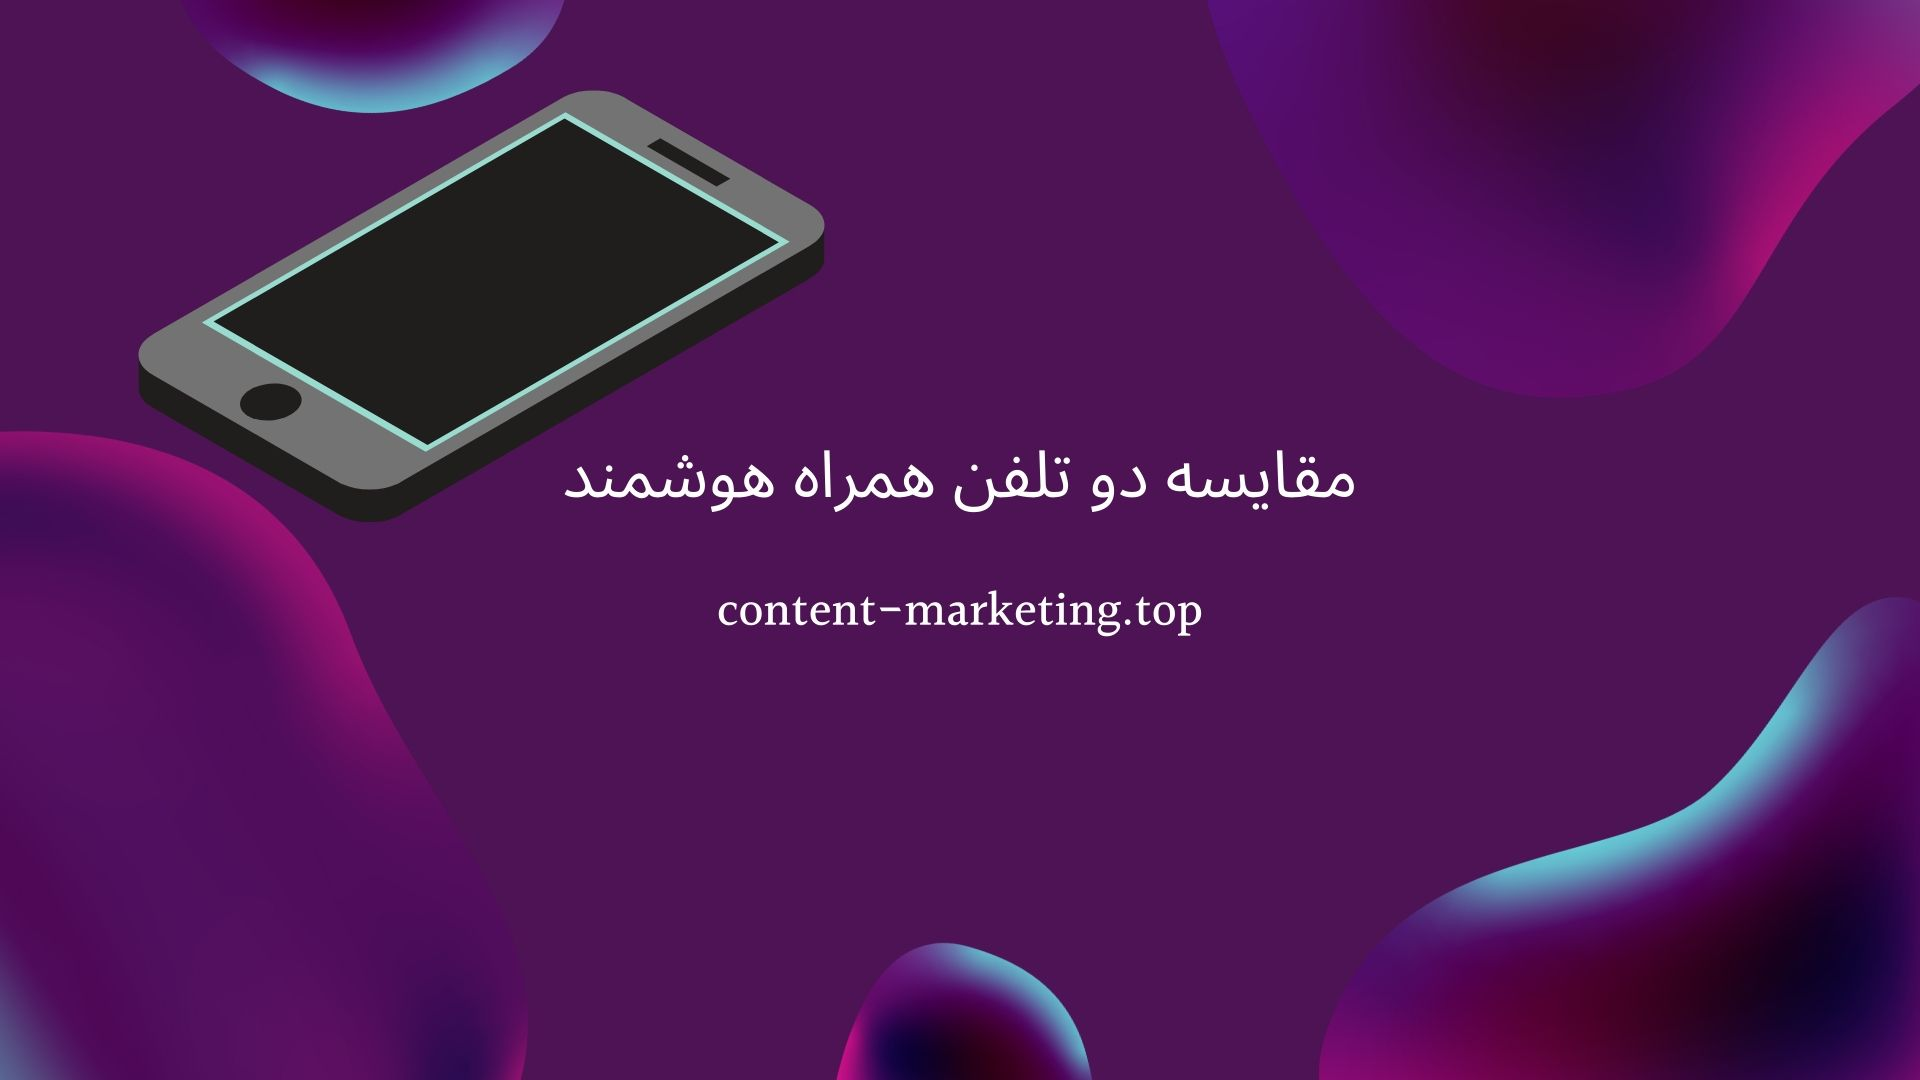 مقایسه دو تلفن همراه هوشمند